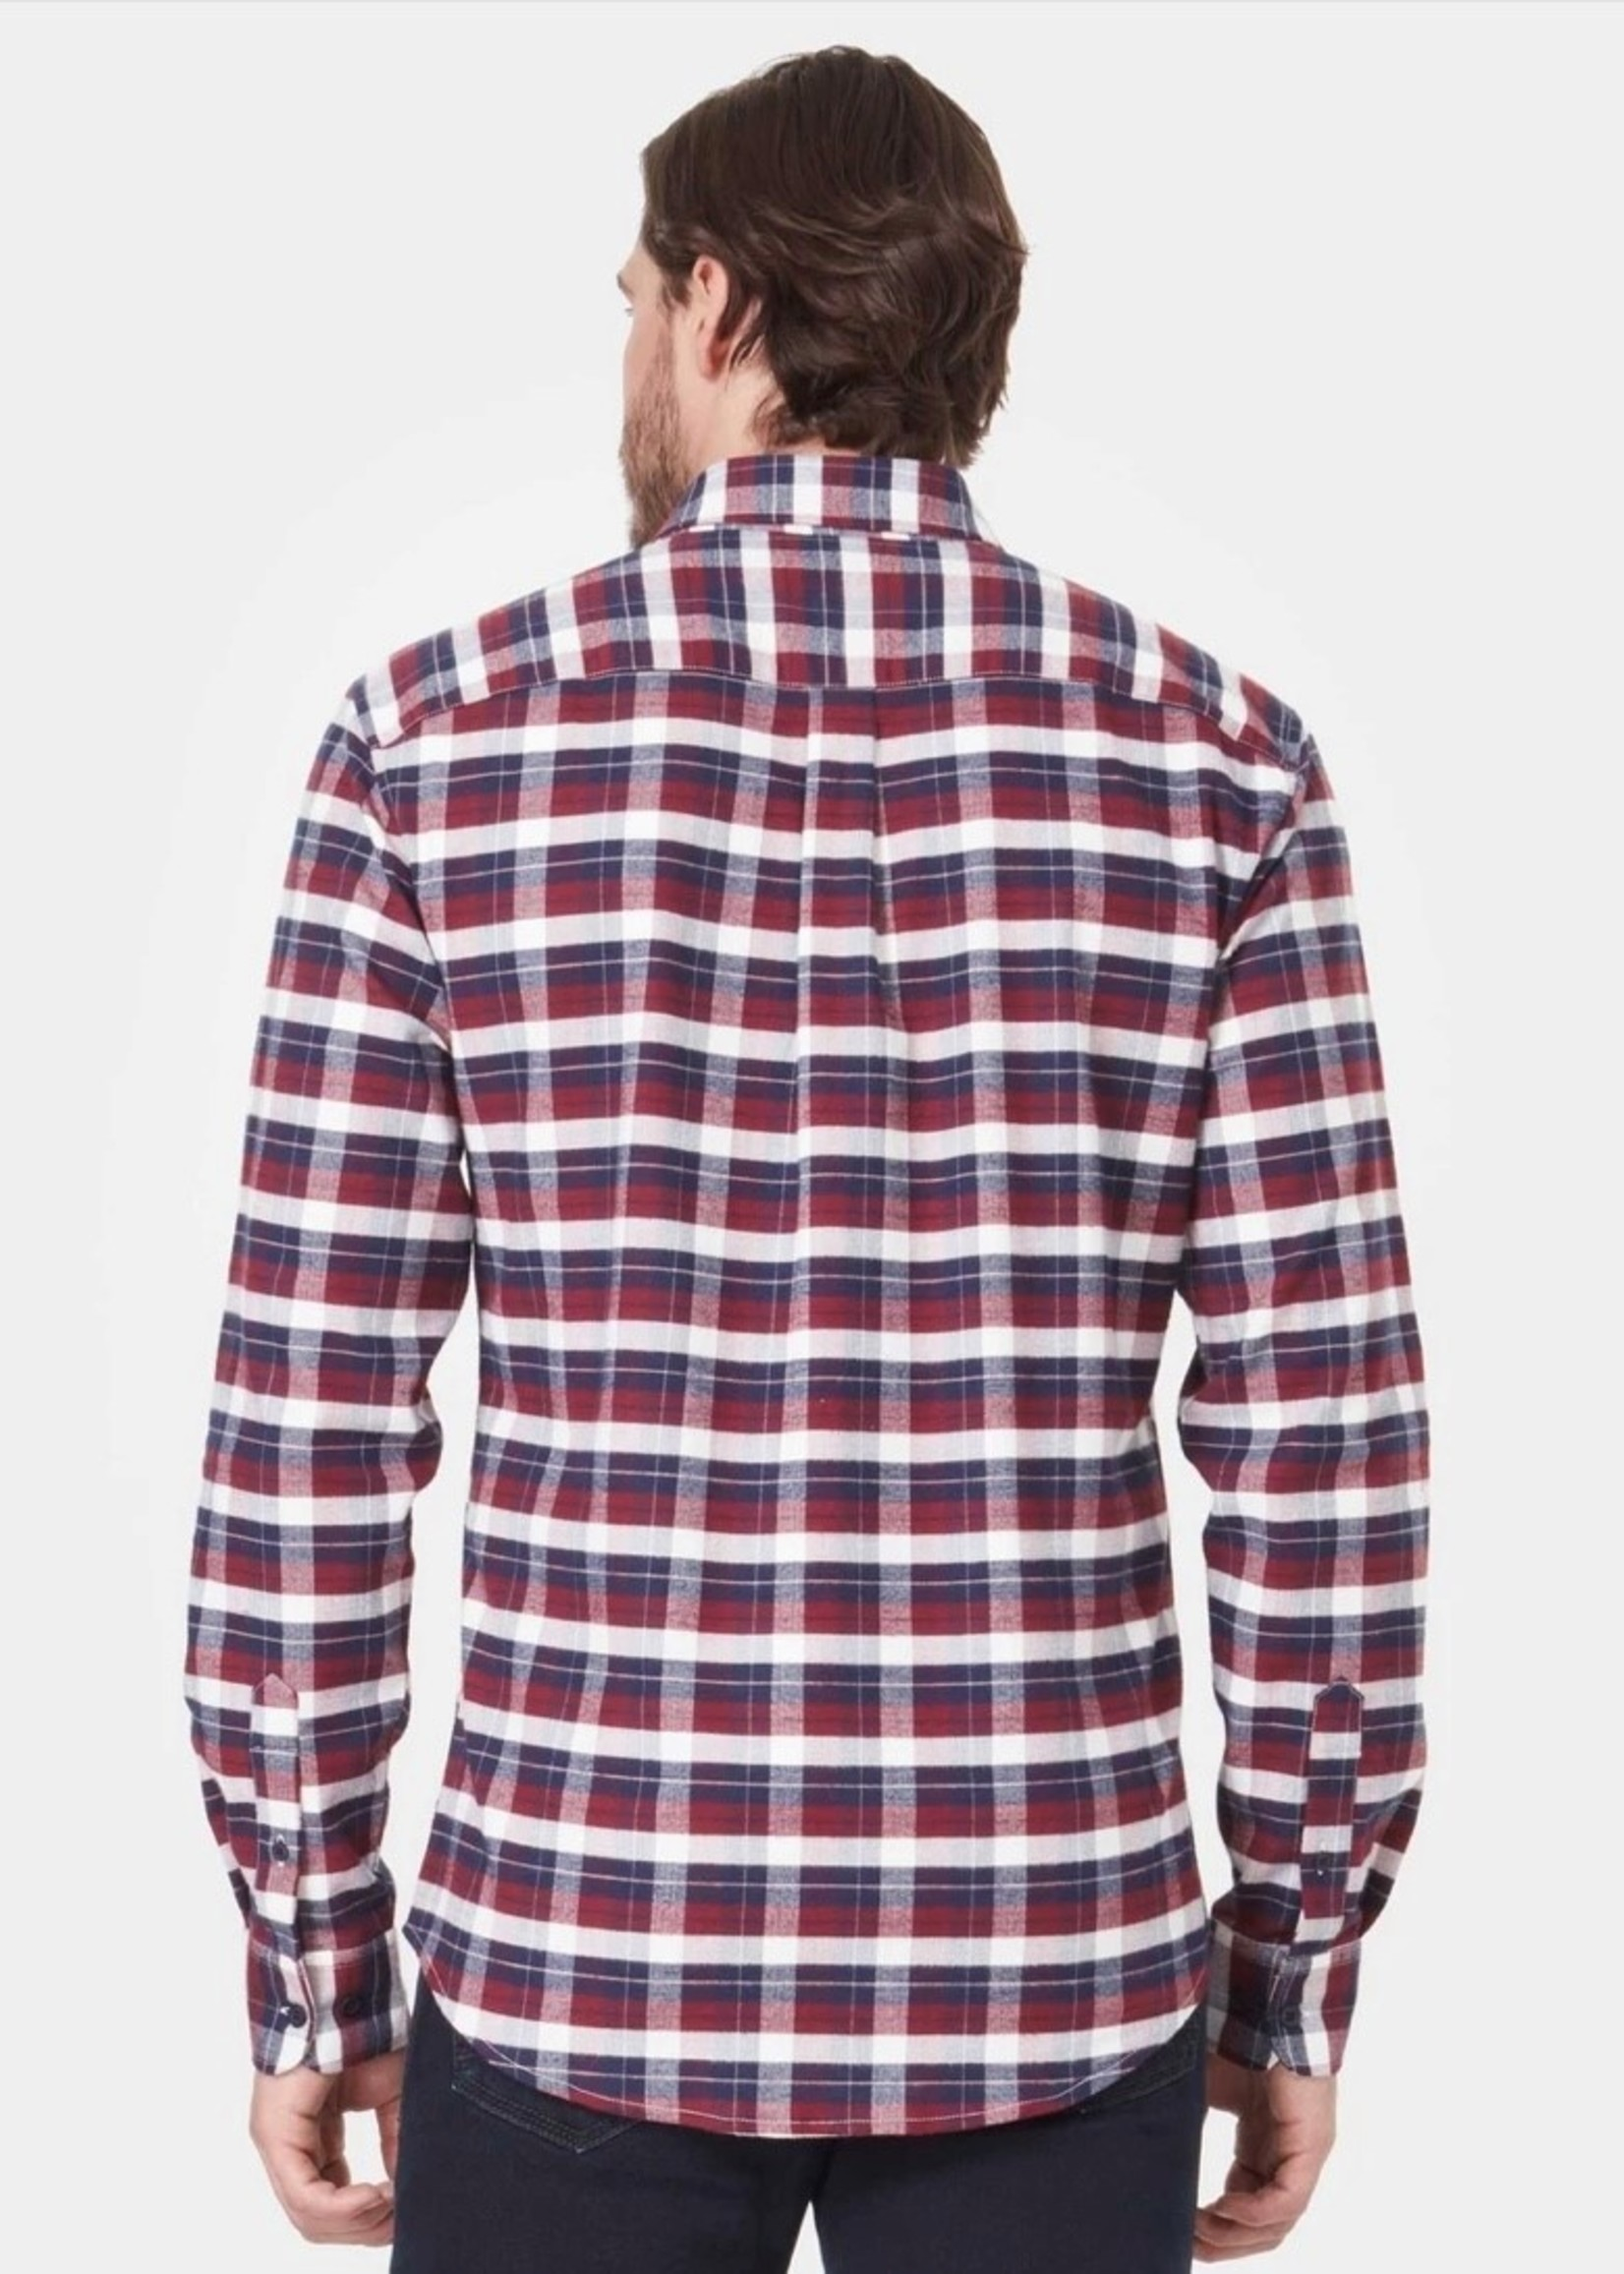 Lois Plaid shirt long sleeve